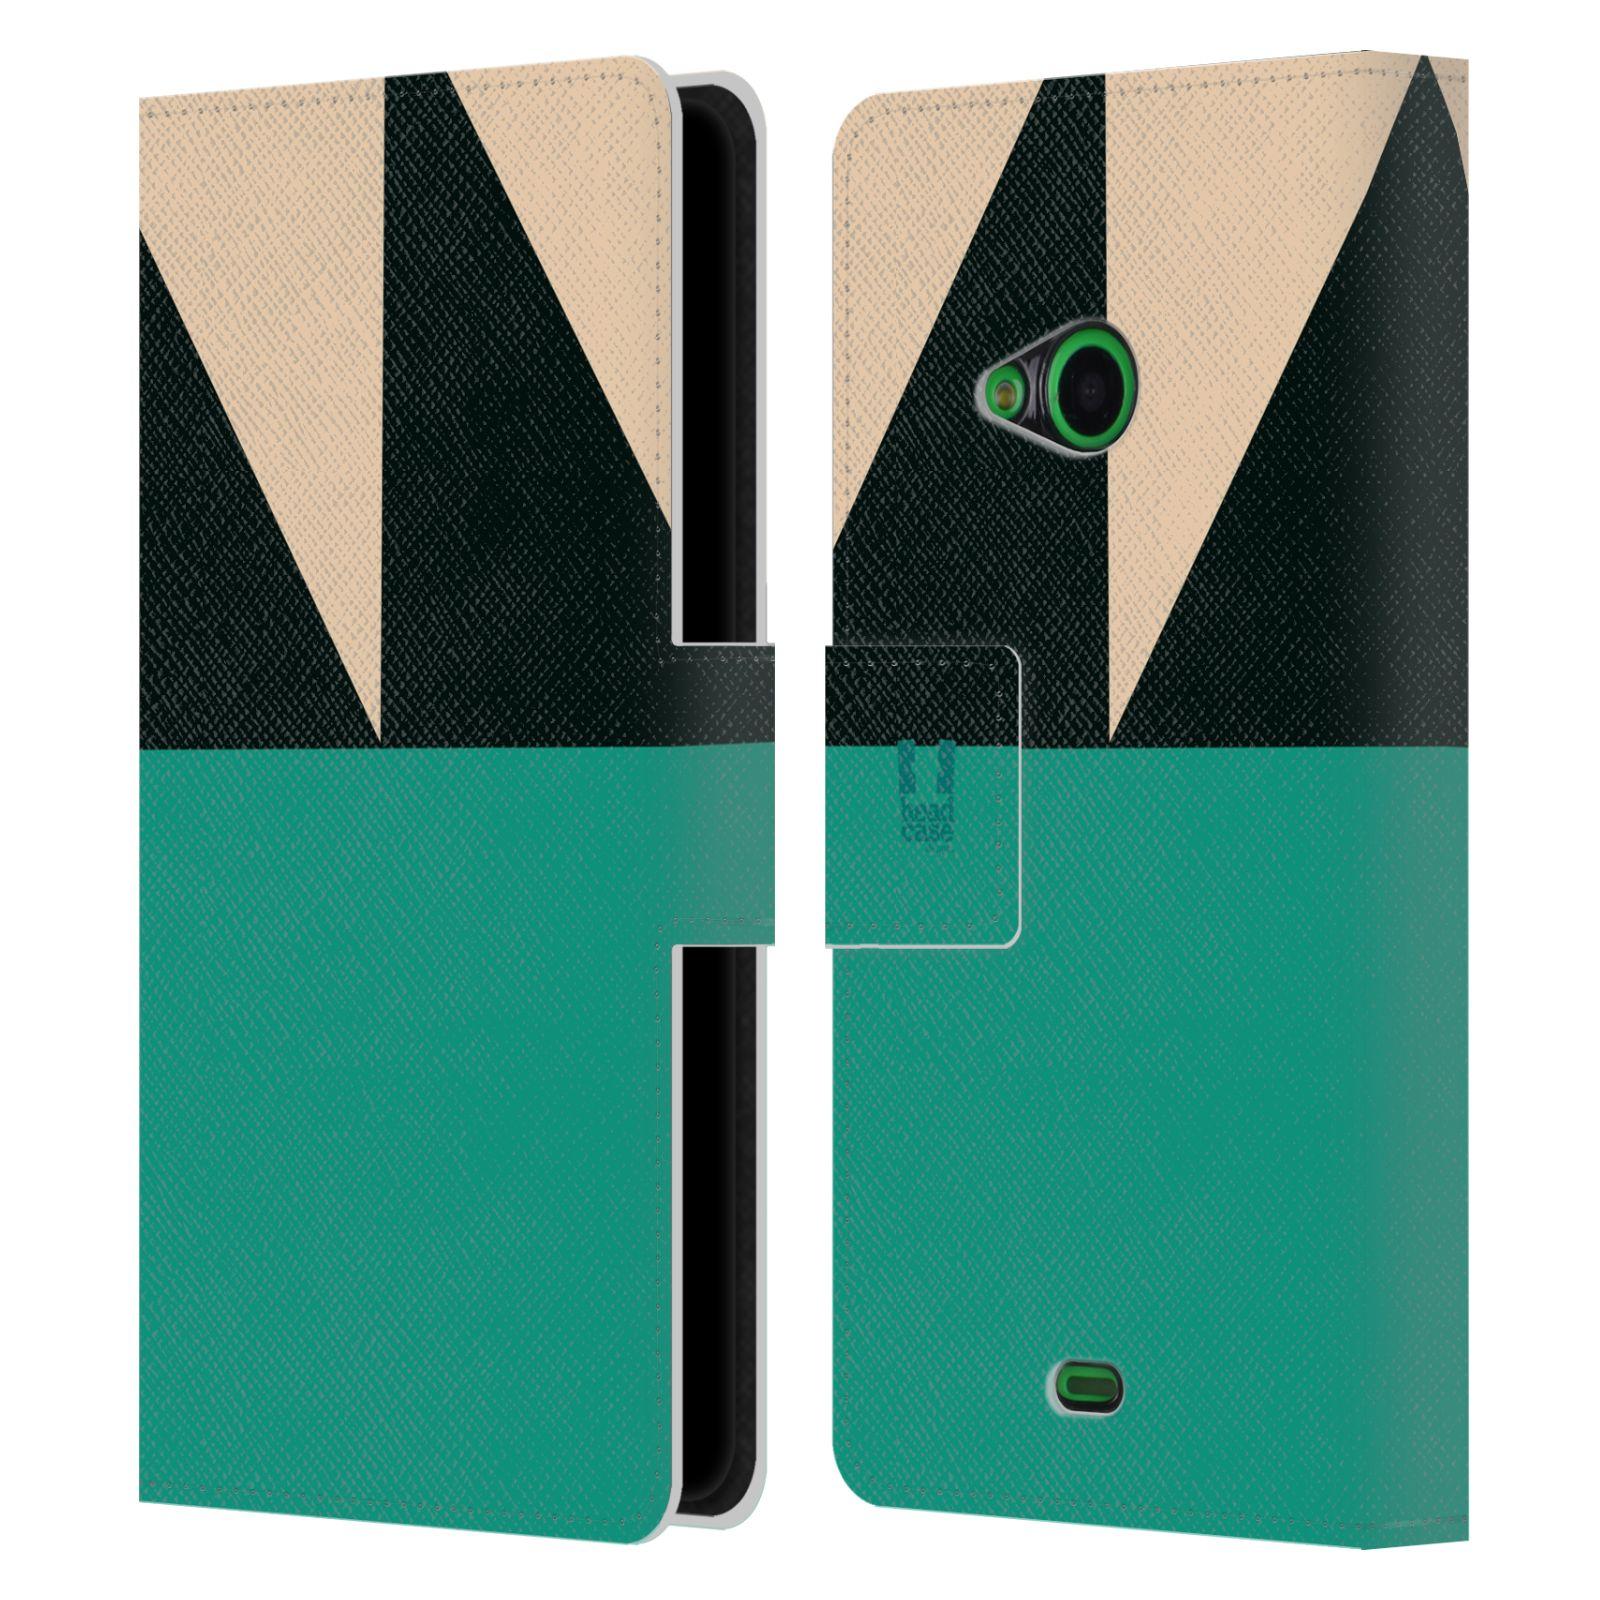 HEAD CASE Flipové pouzdro pro mobil Nokia LUMIA 535 barevné tvary moře modrá